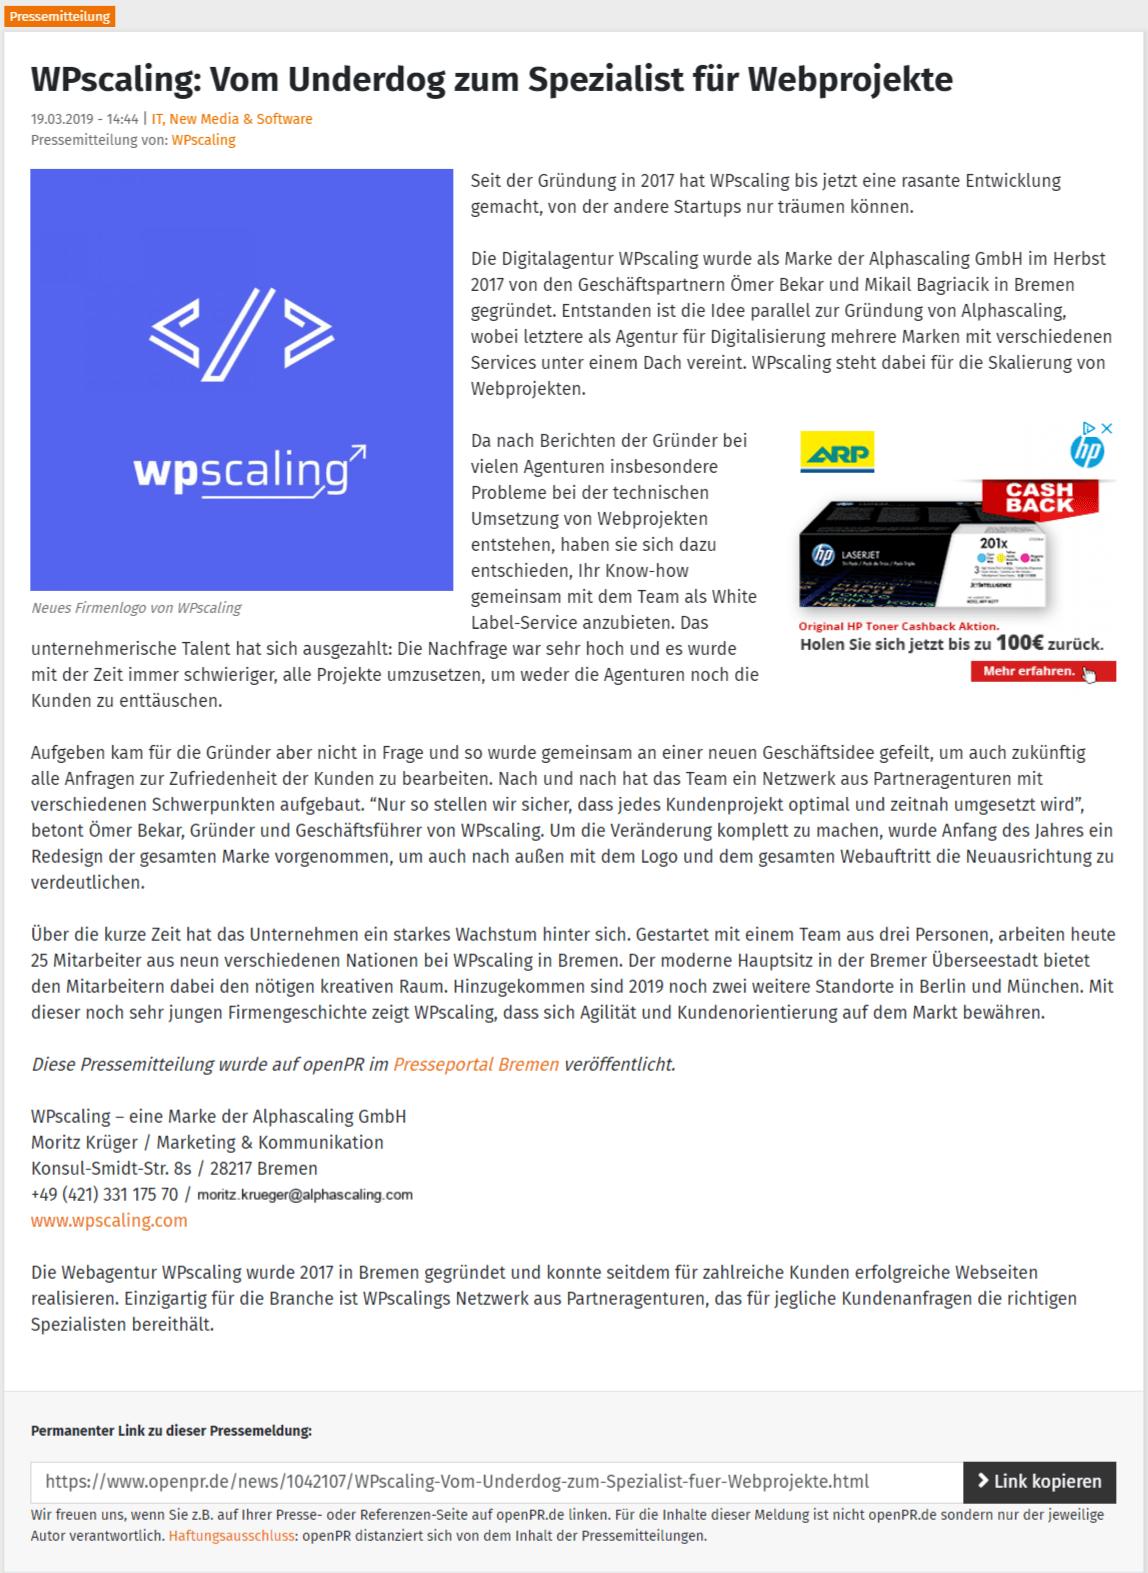 WPscaling Presse